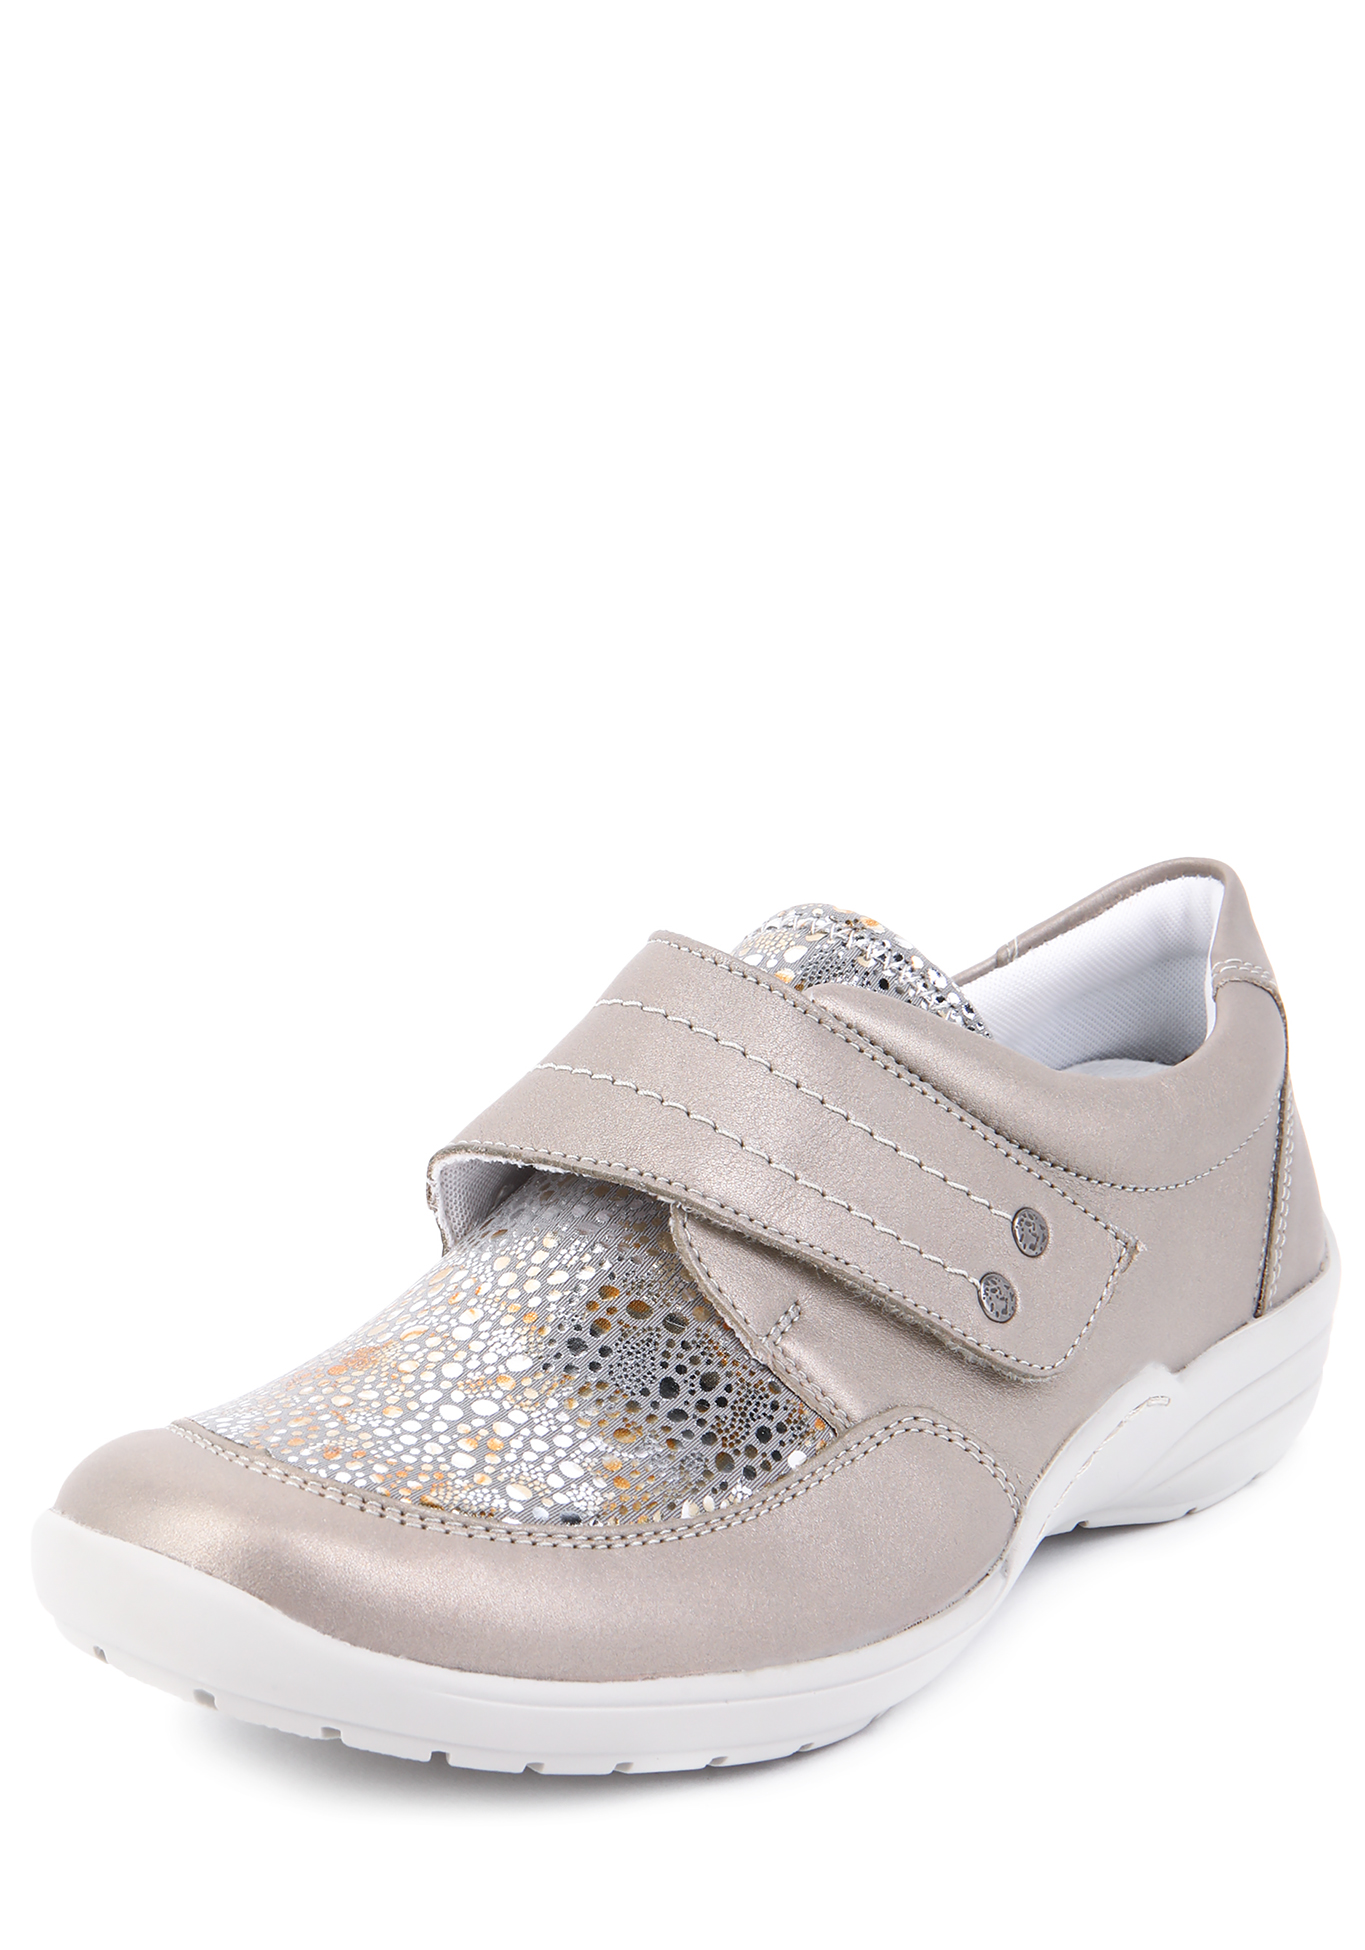 Туфли женские Мона